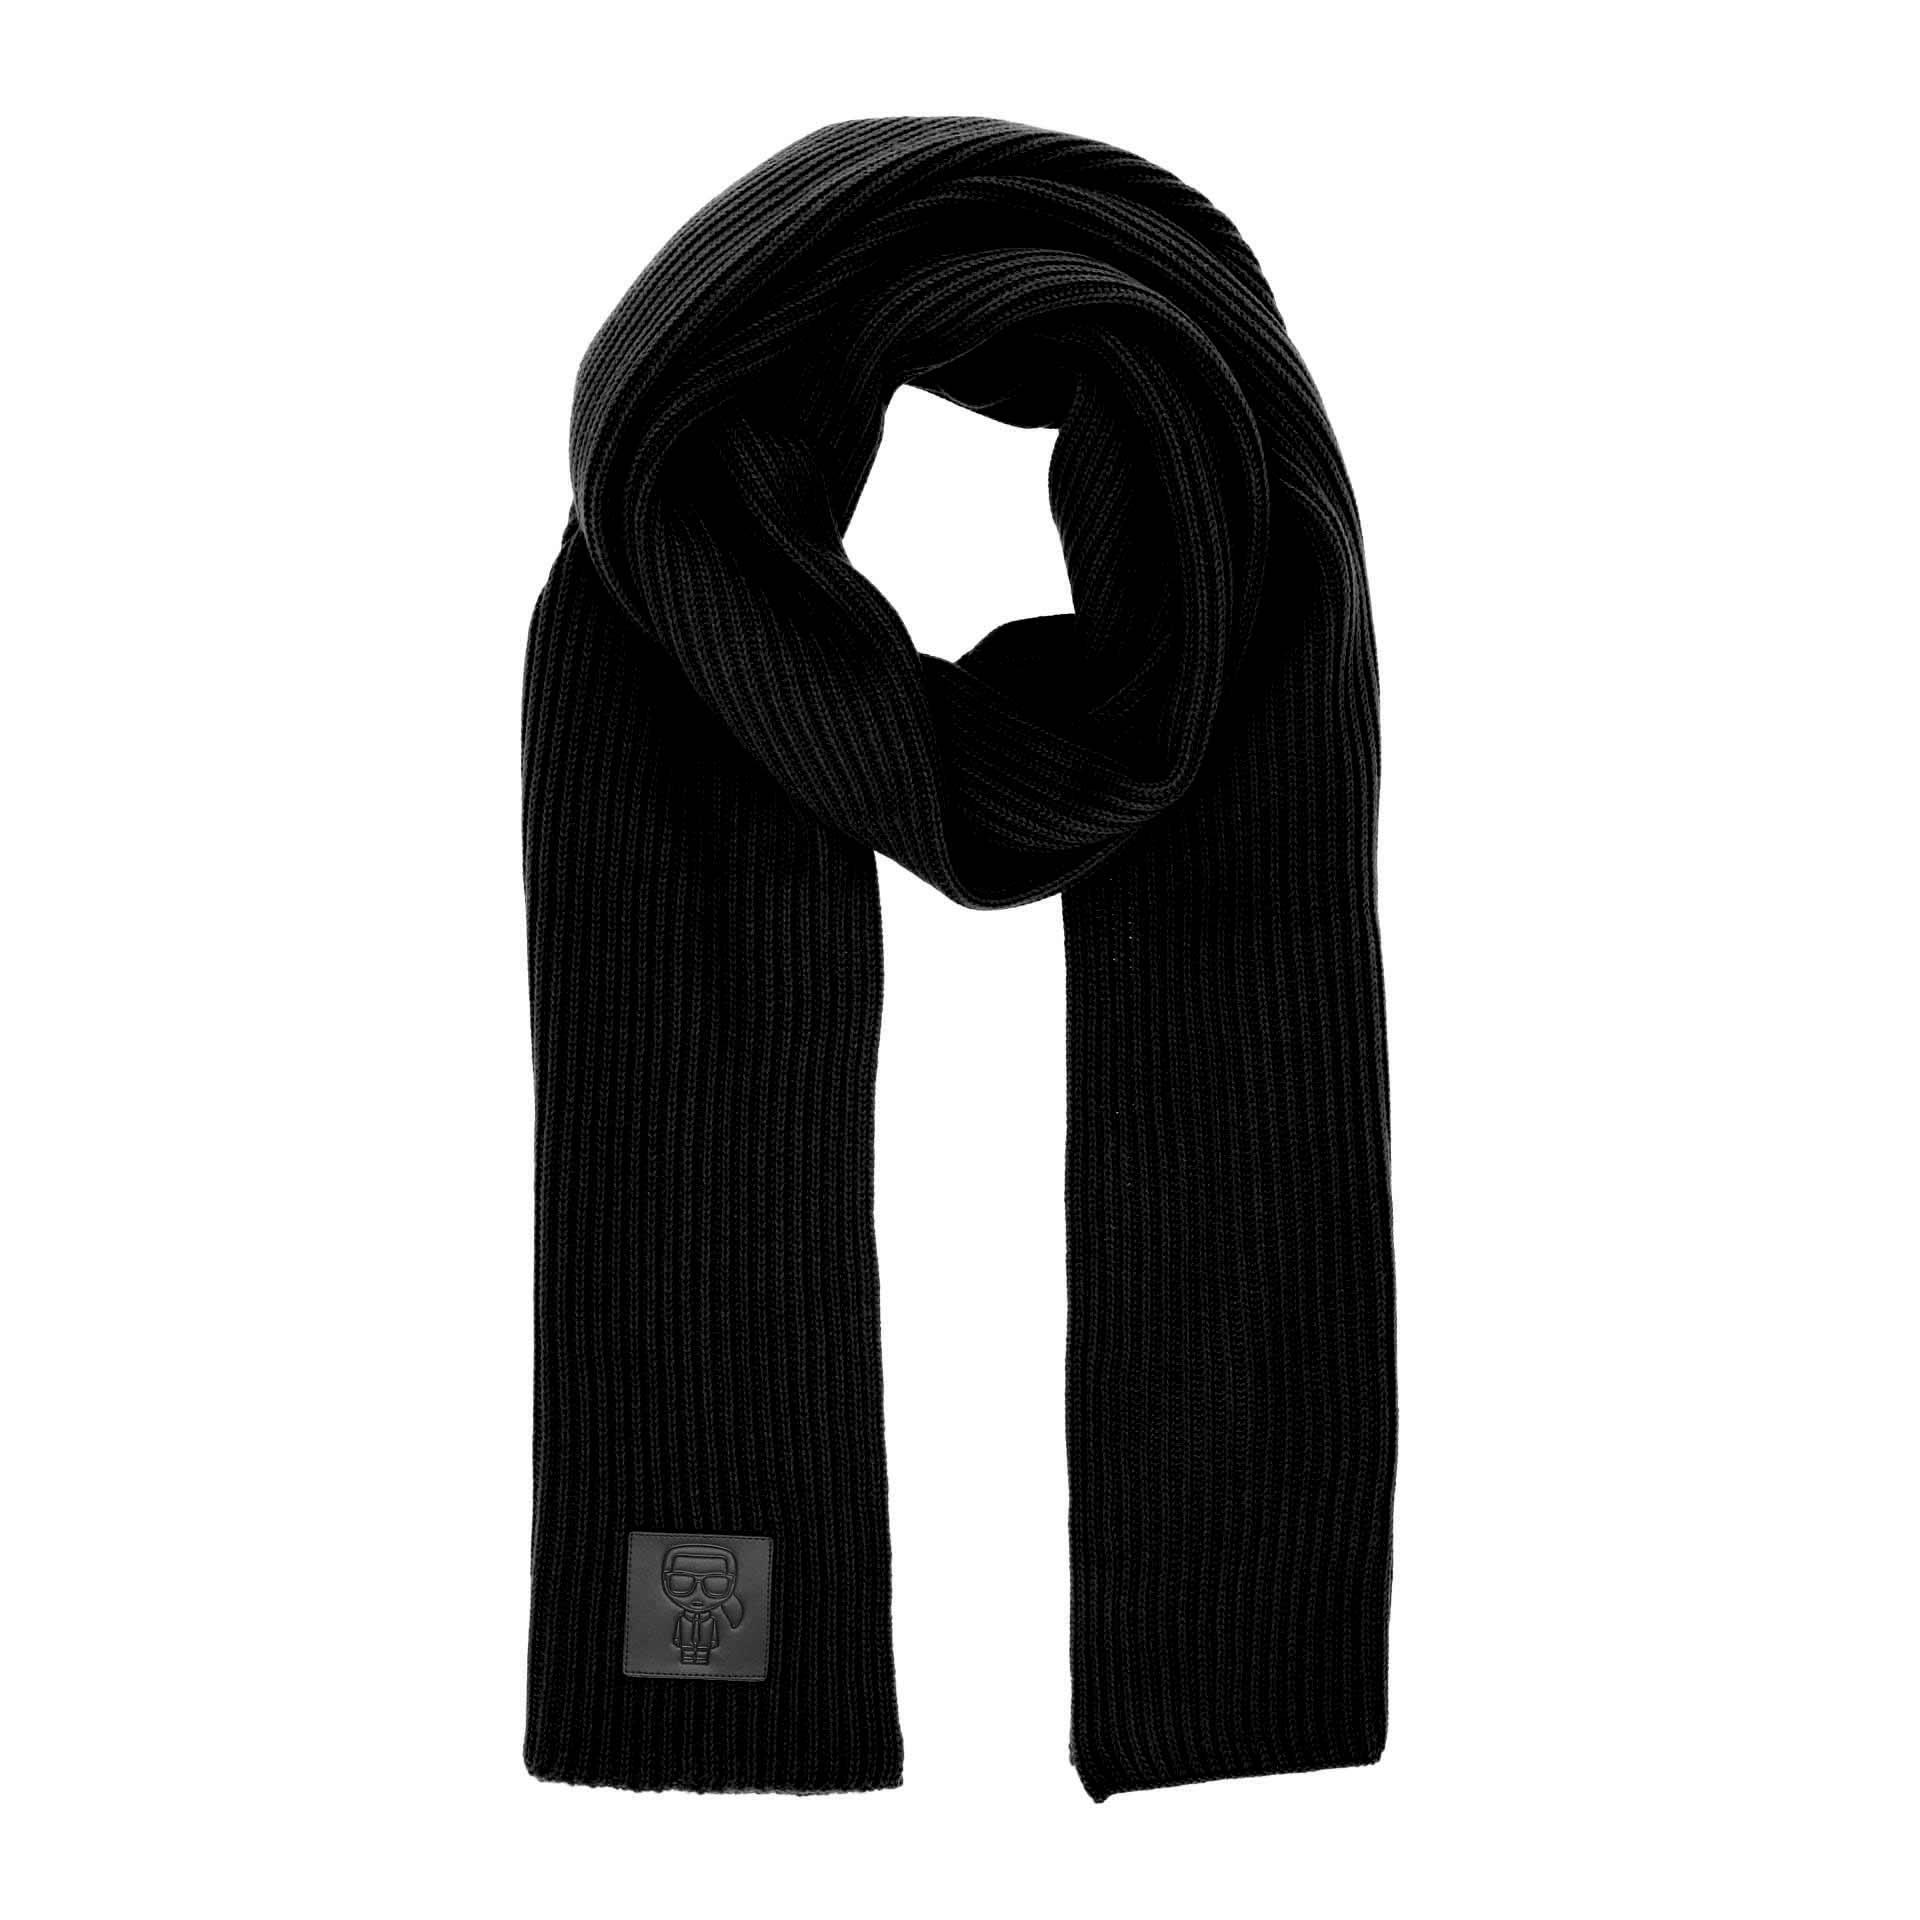 K/Ikonik Schal mit Patch black